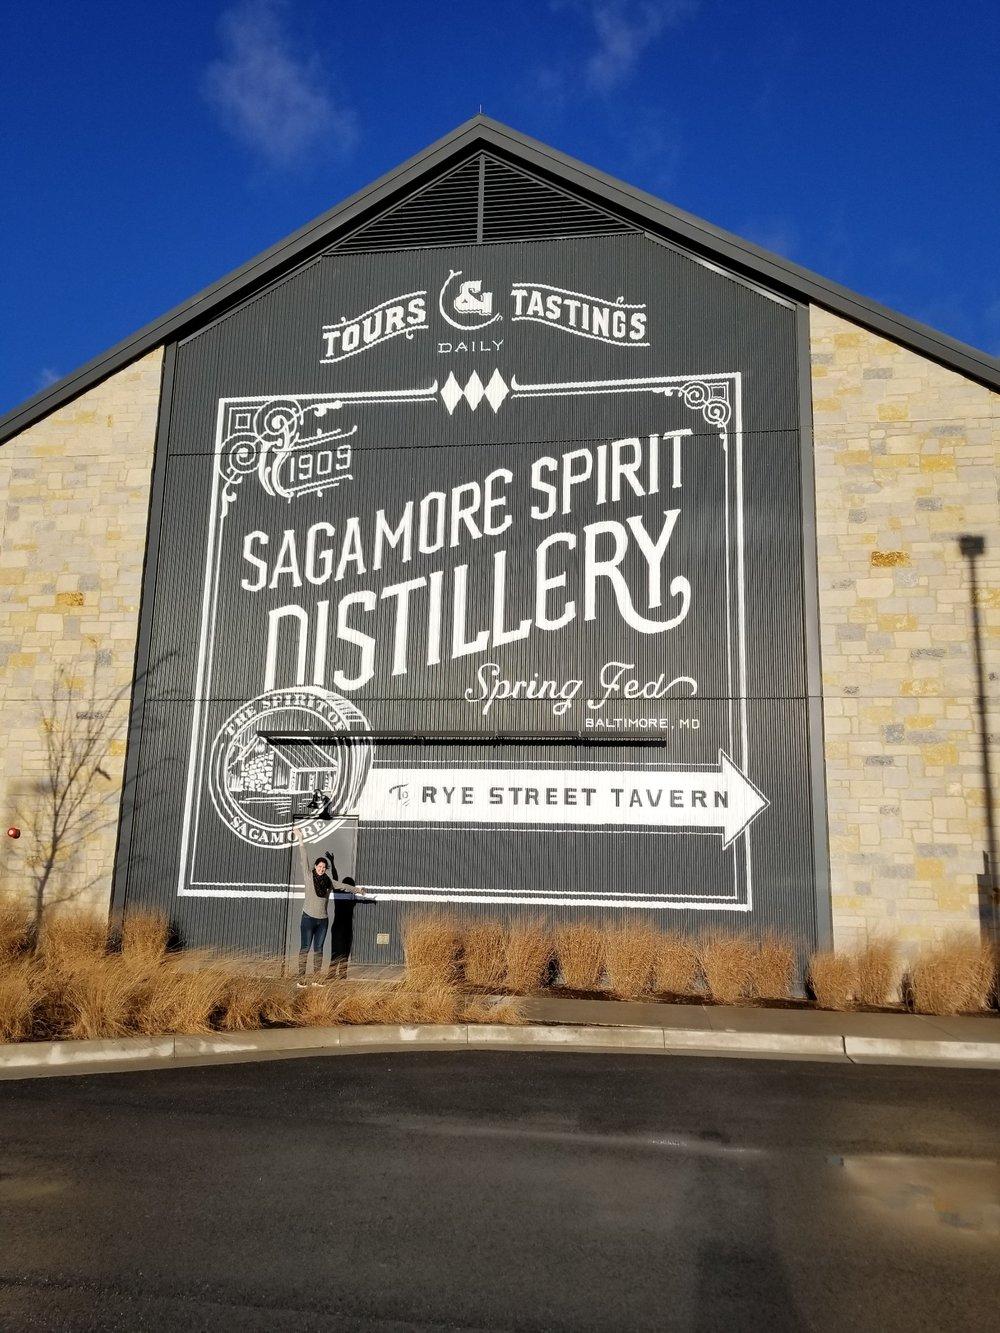 Sagamore Distillery